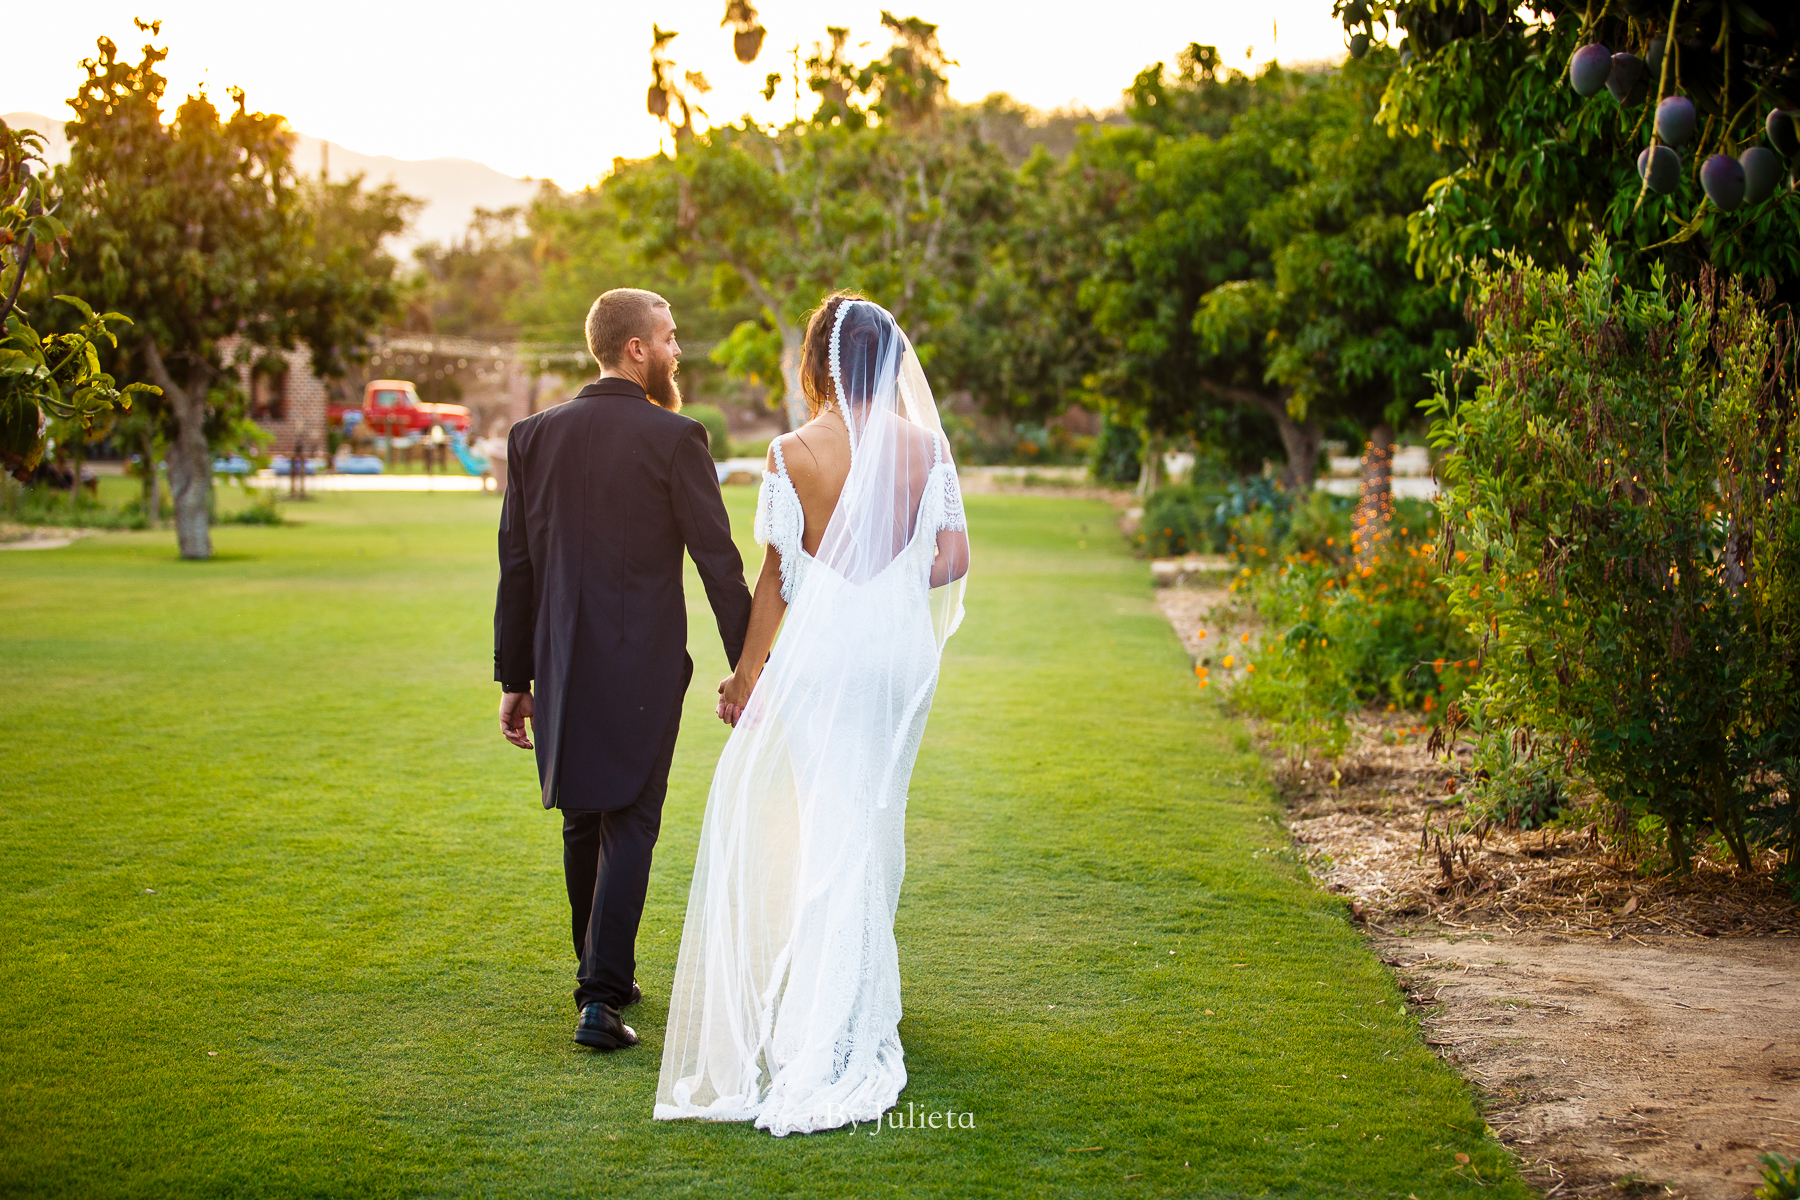 Floras Farm Cabo Wedding, Sory and Kane, Julieta Amezcua Photography. (239 of 364).jpg